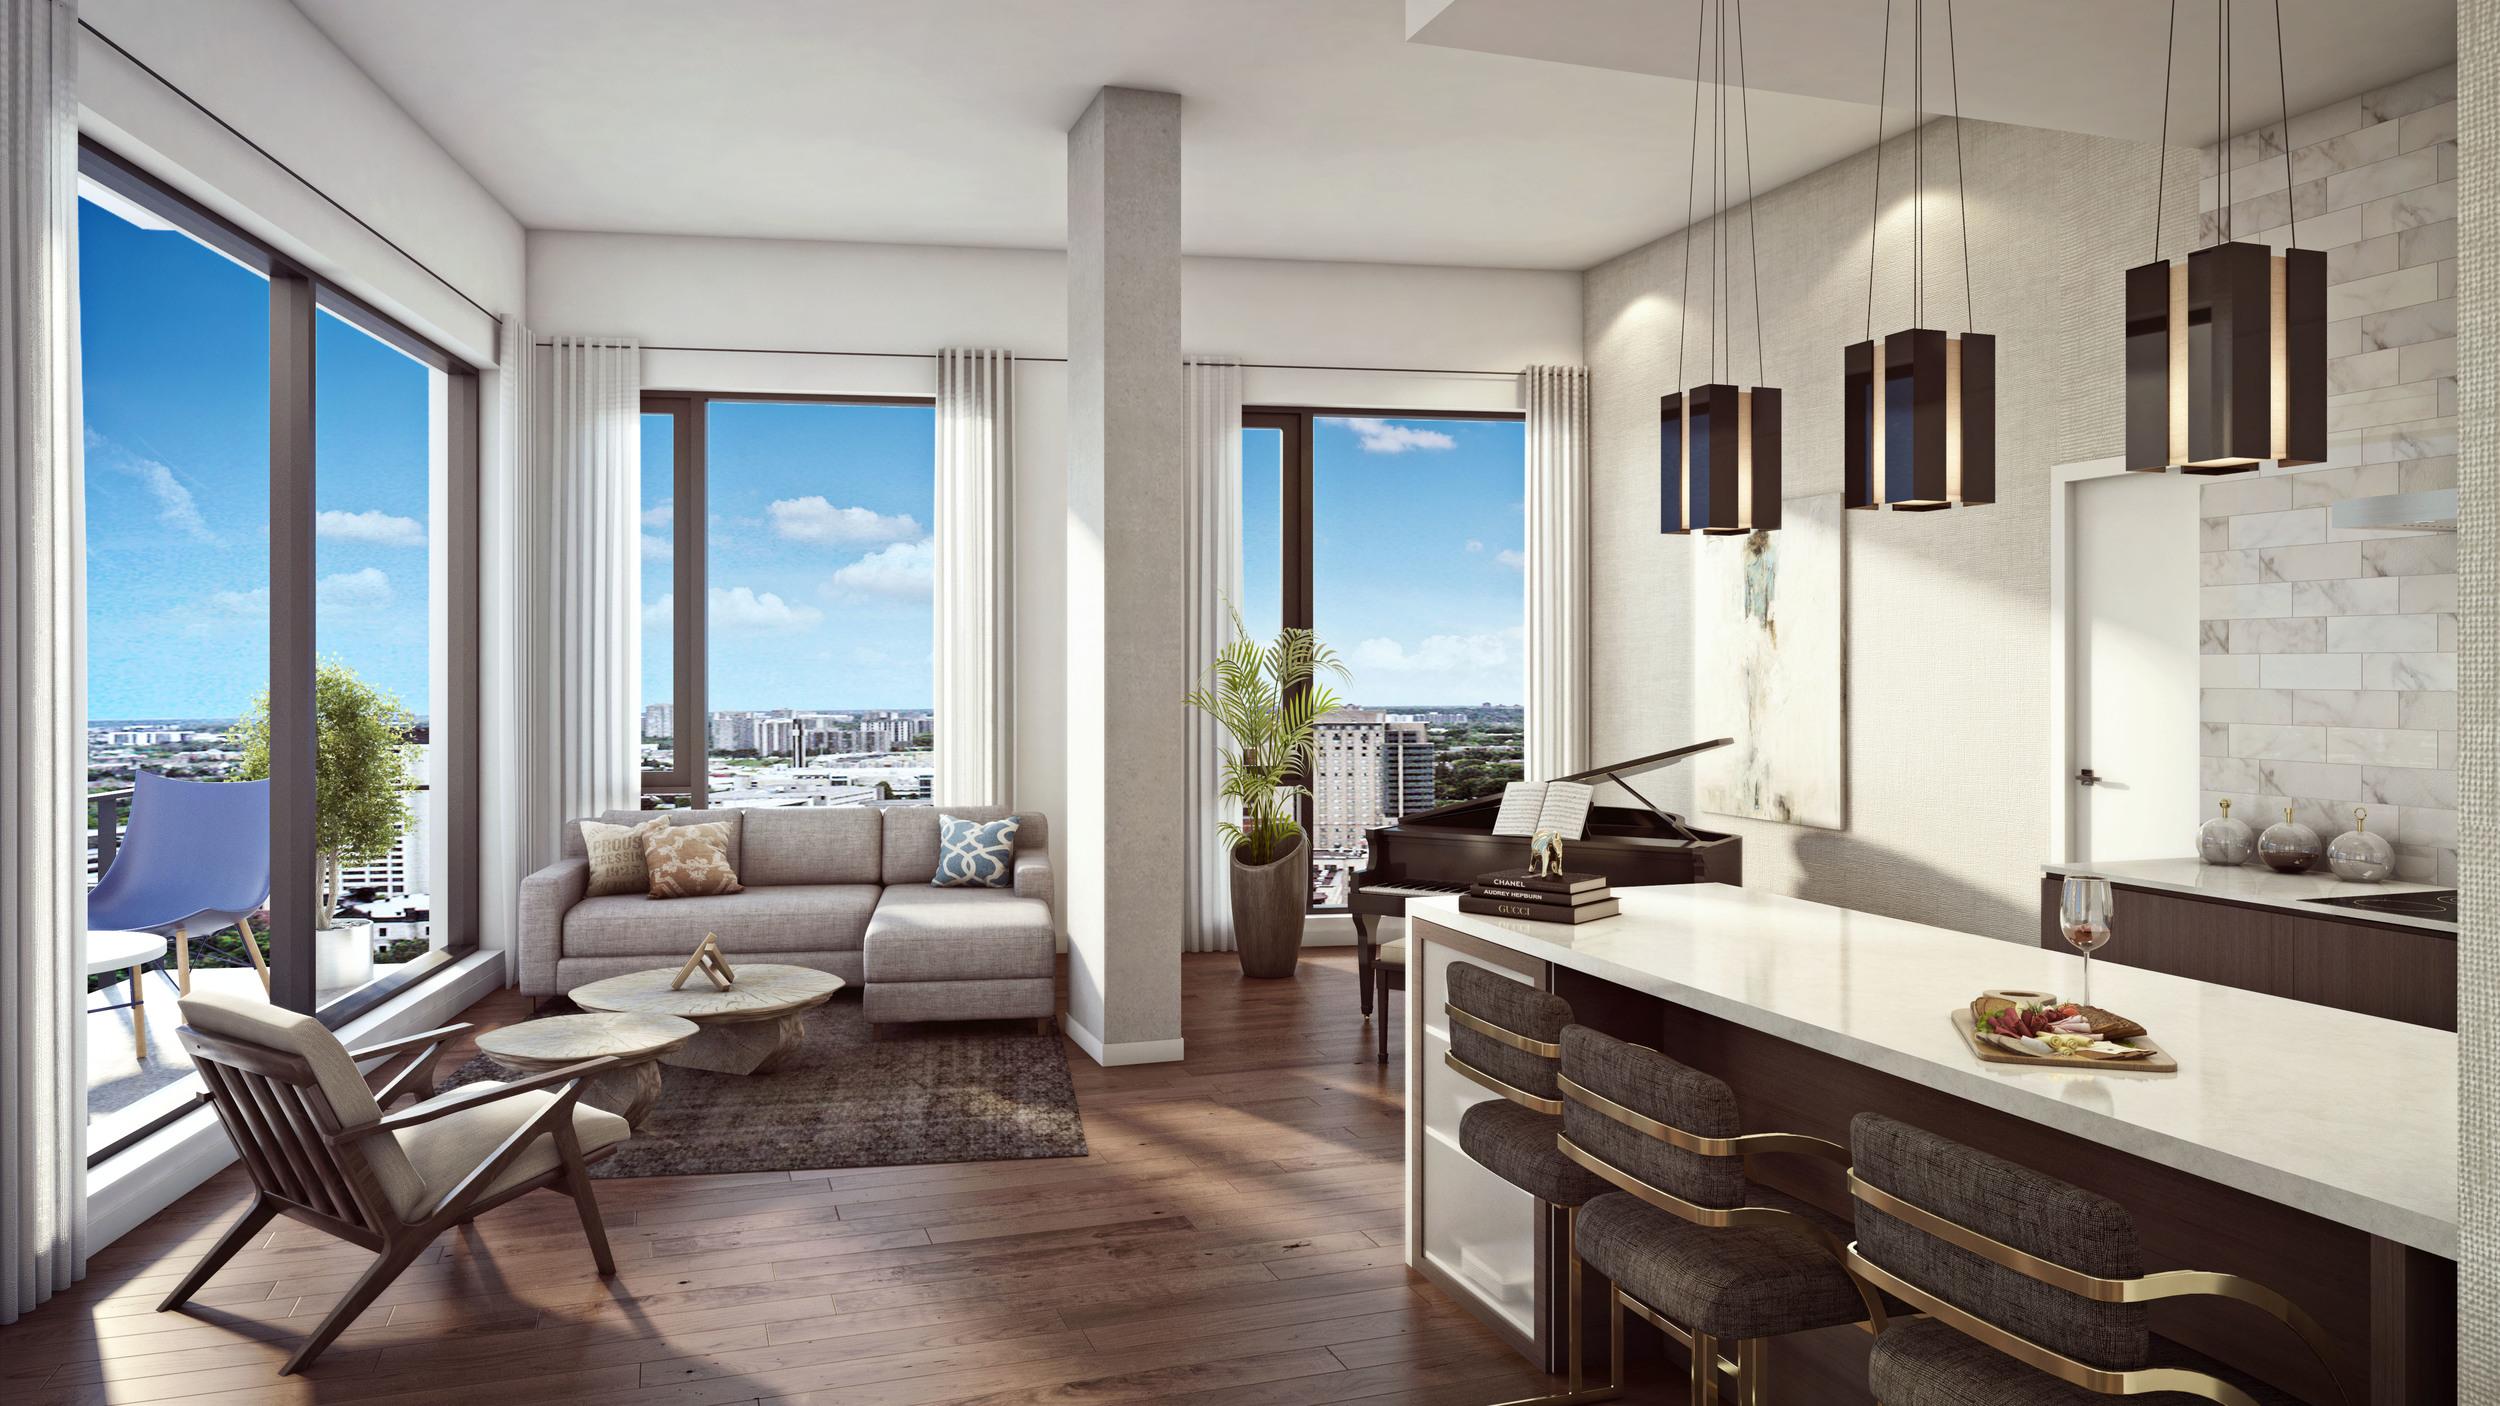 2589_Arthaus_Penthouse_2304_005_HD.JPG